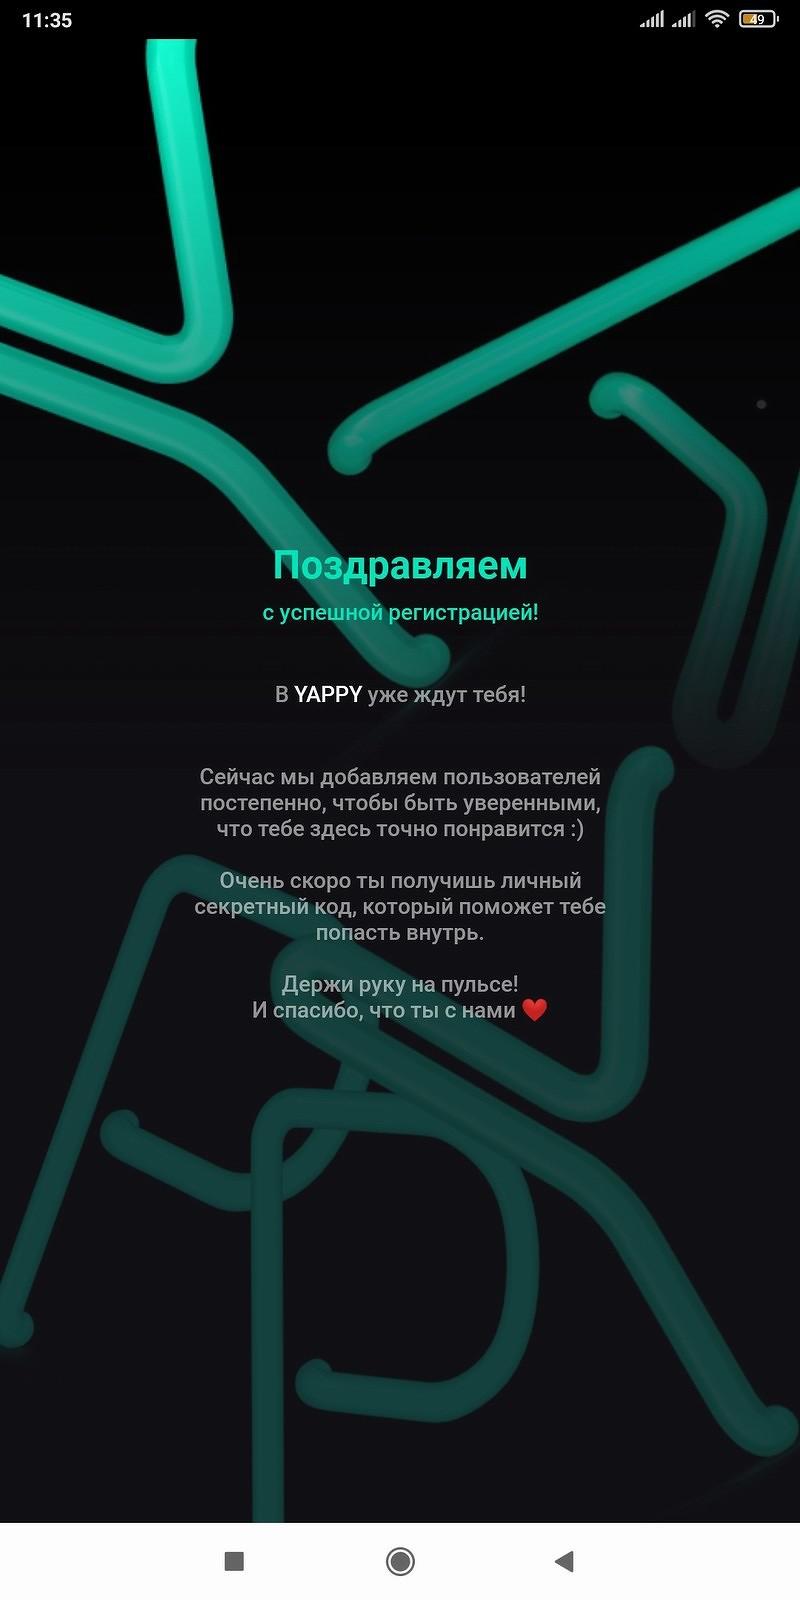 yappy602.jpg